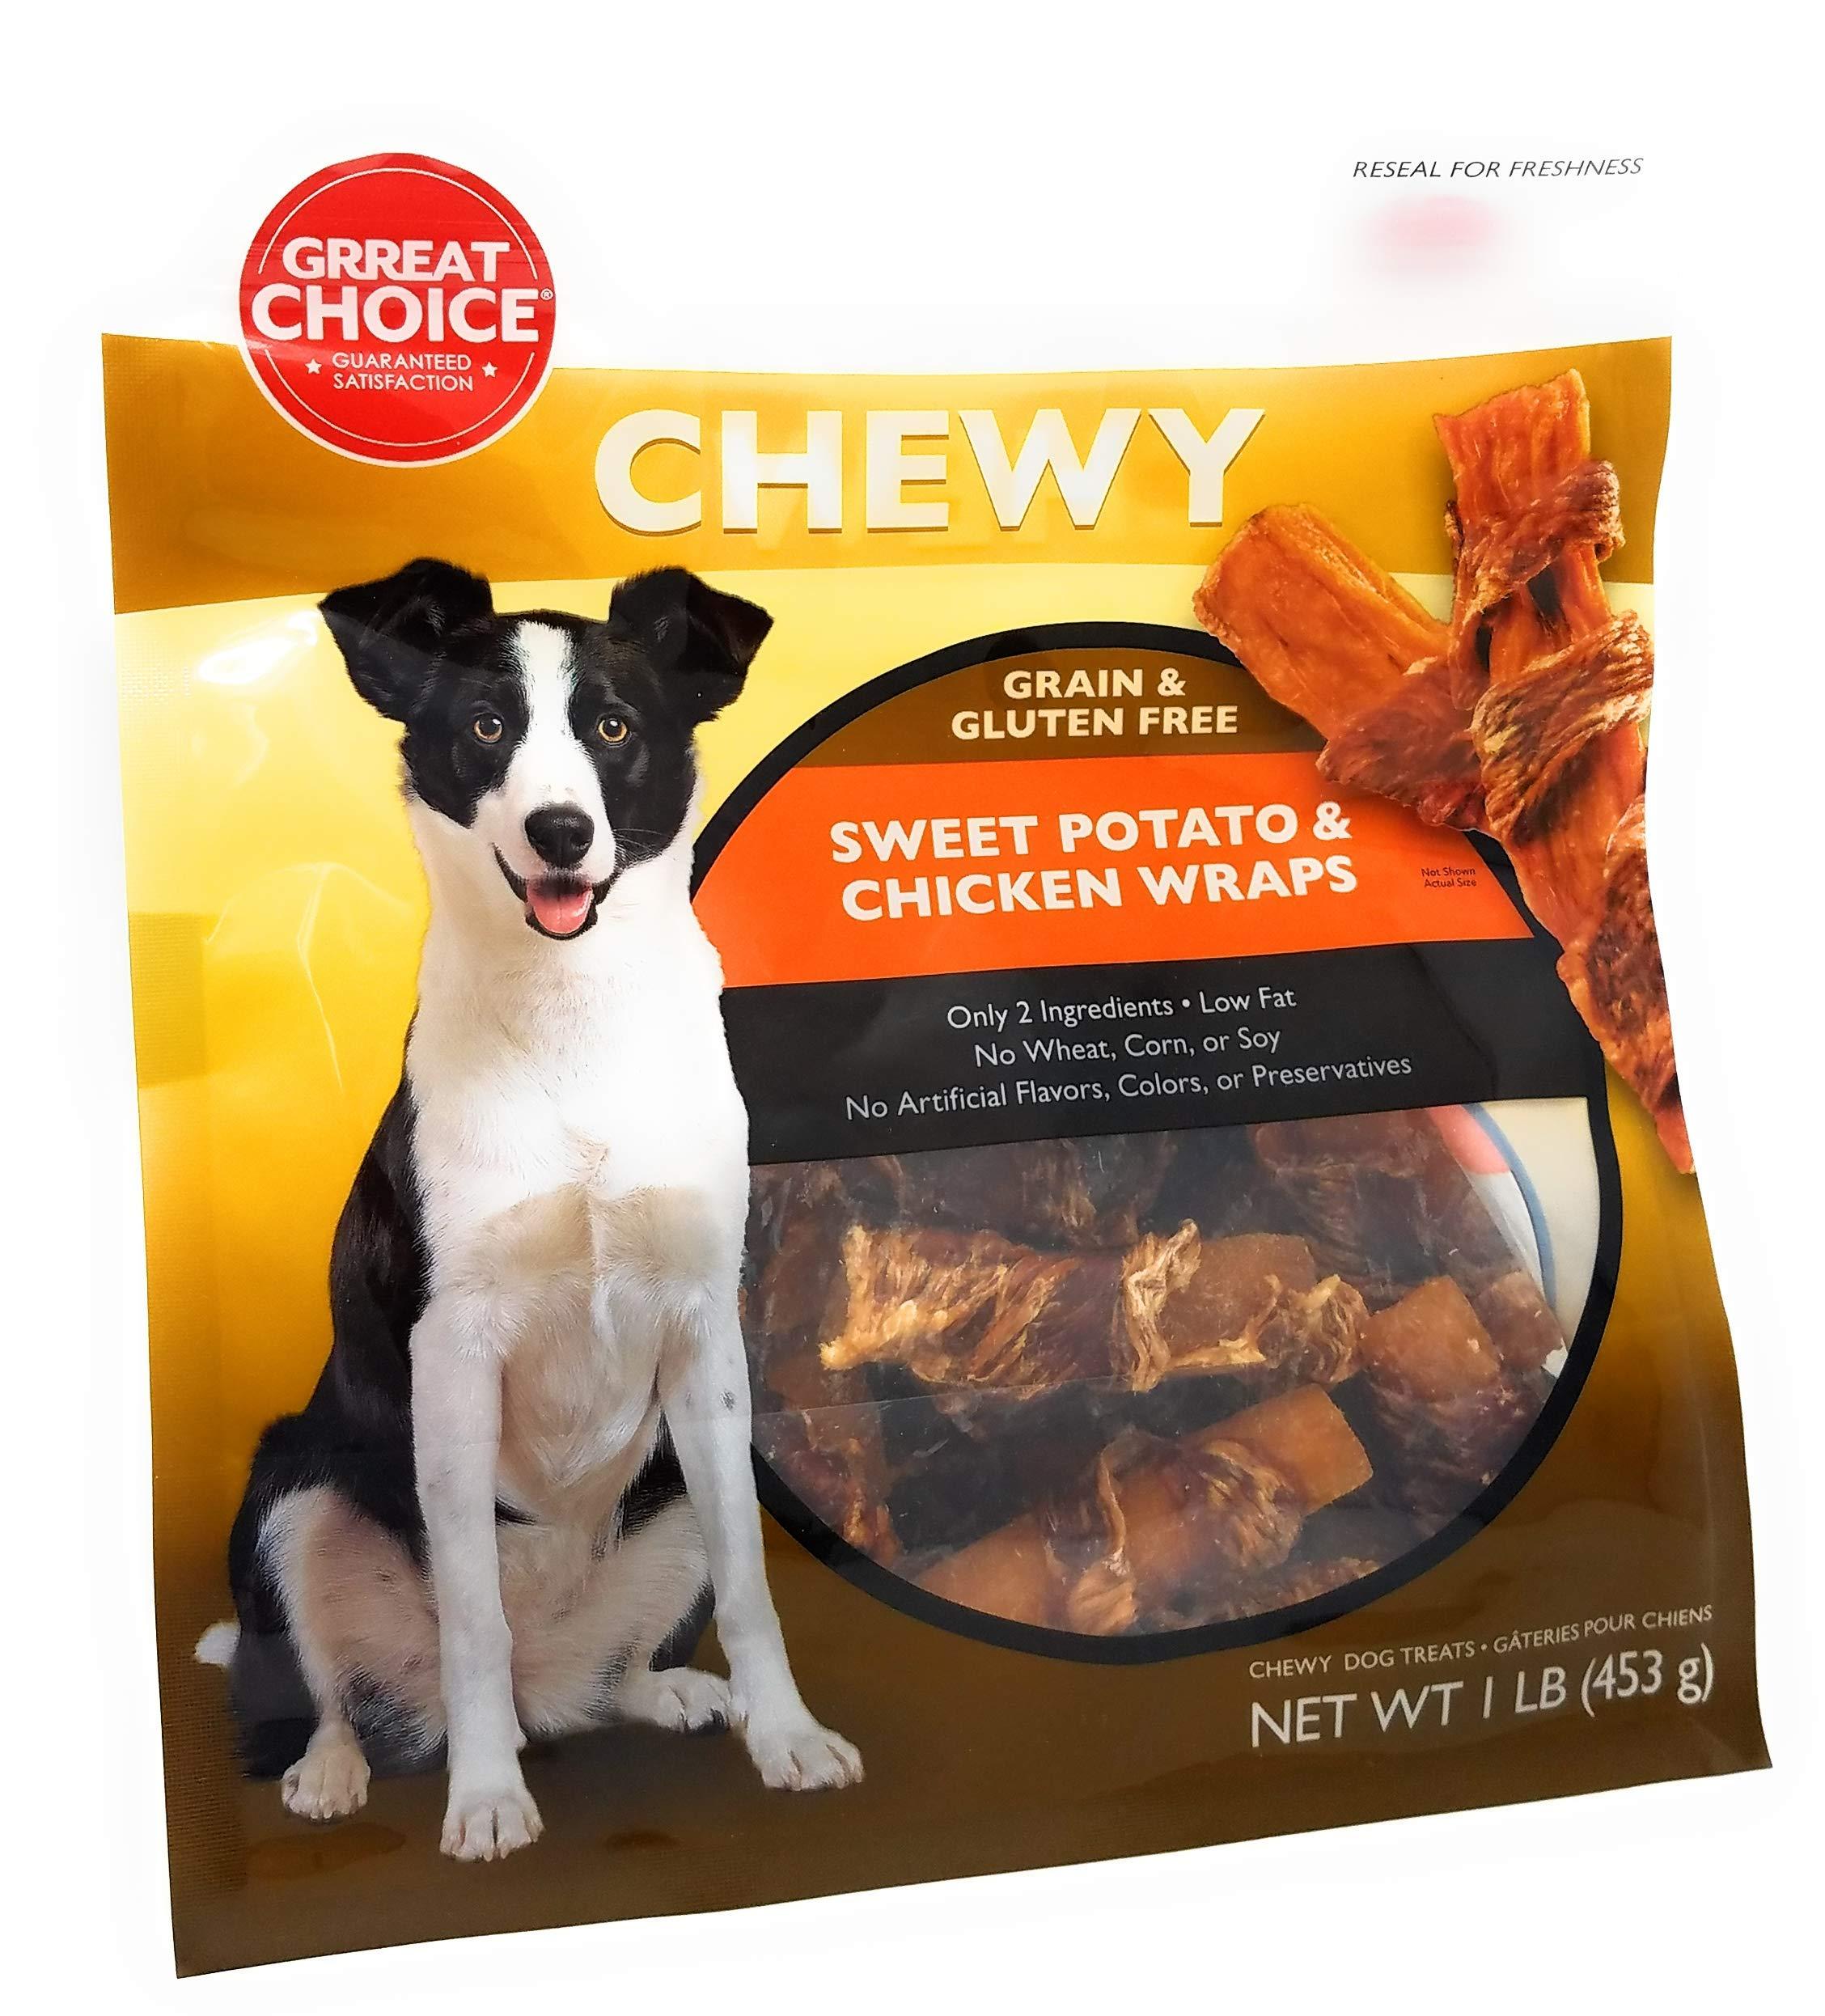 Chewy Grain & Gluten Free Sweet Potato & Chicken Wraps by Generic